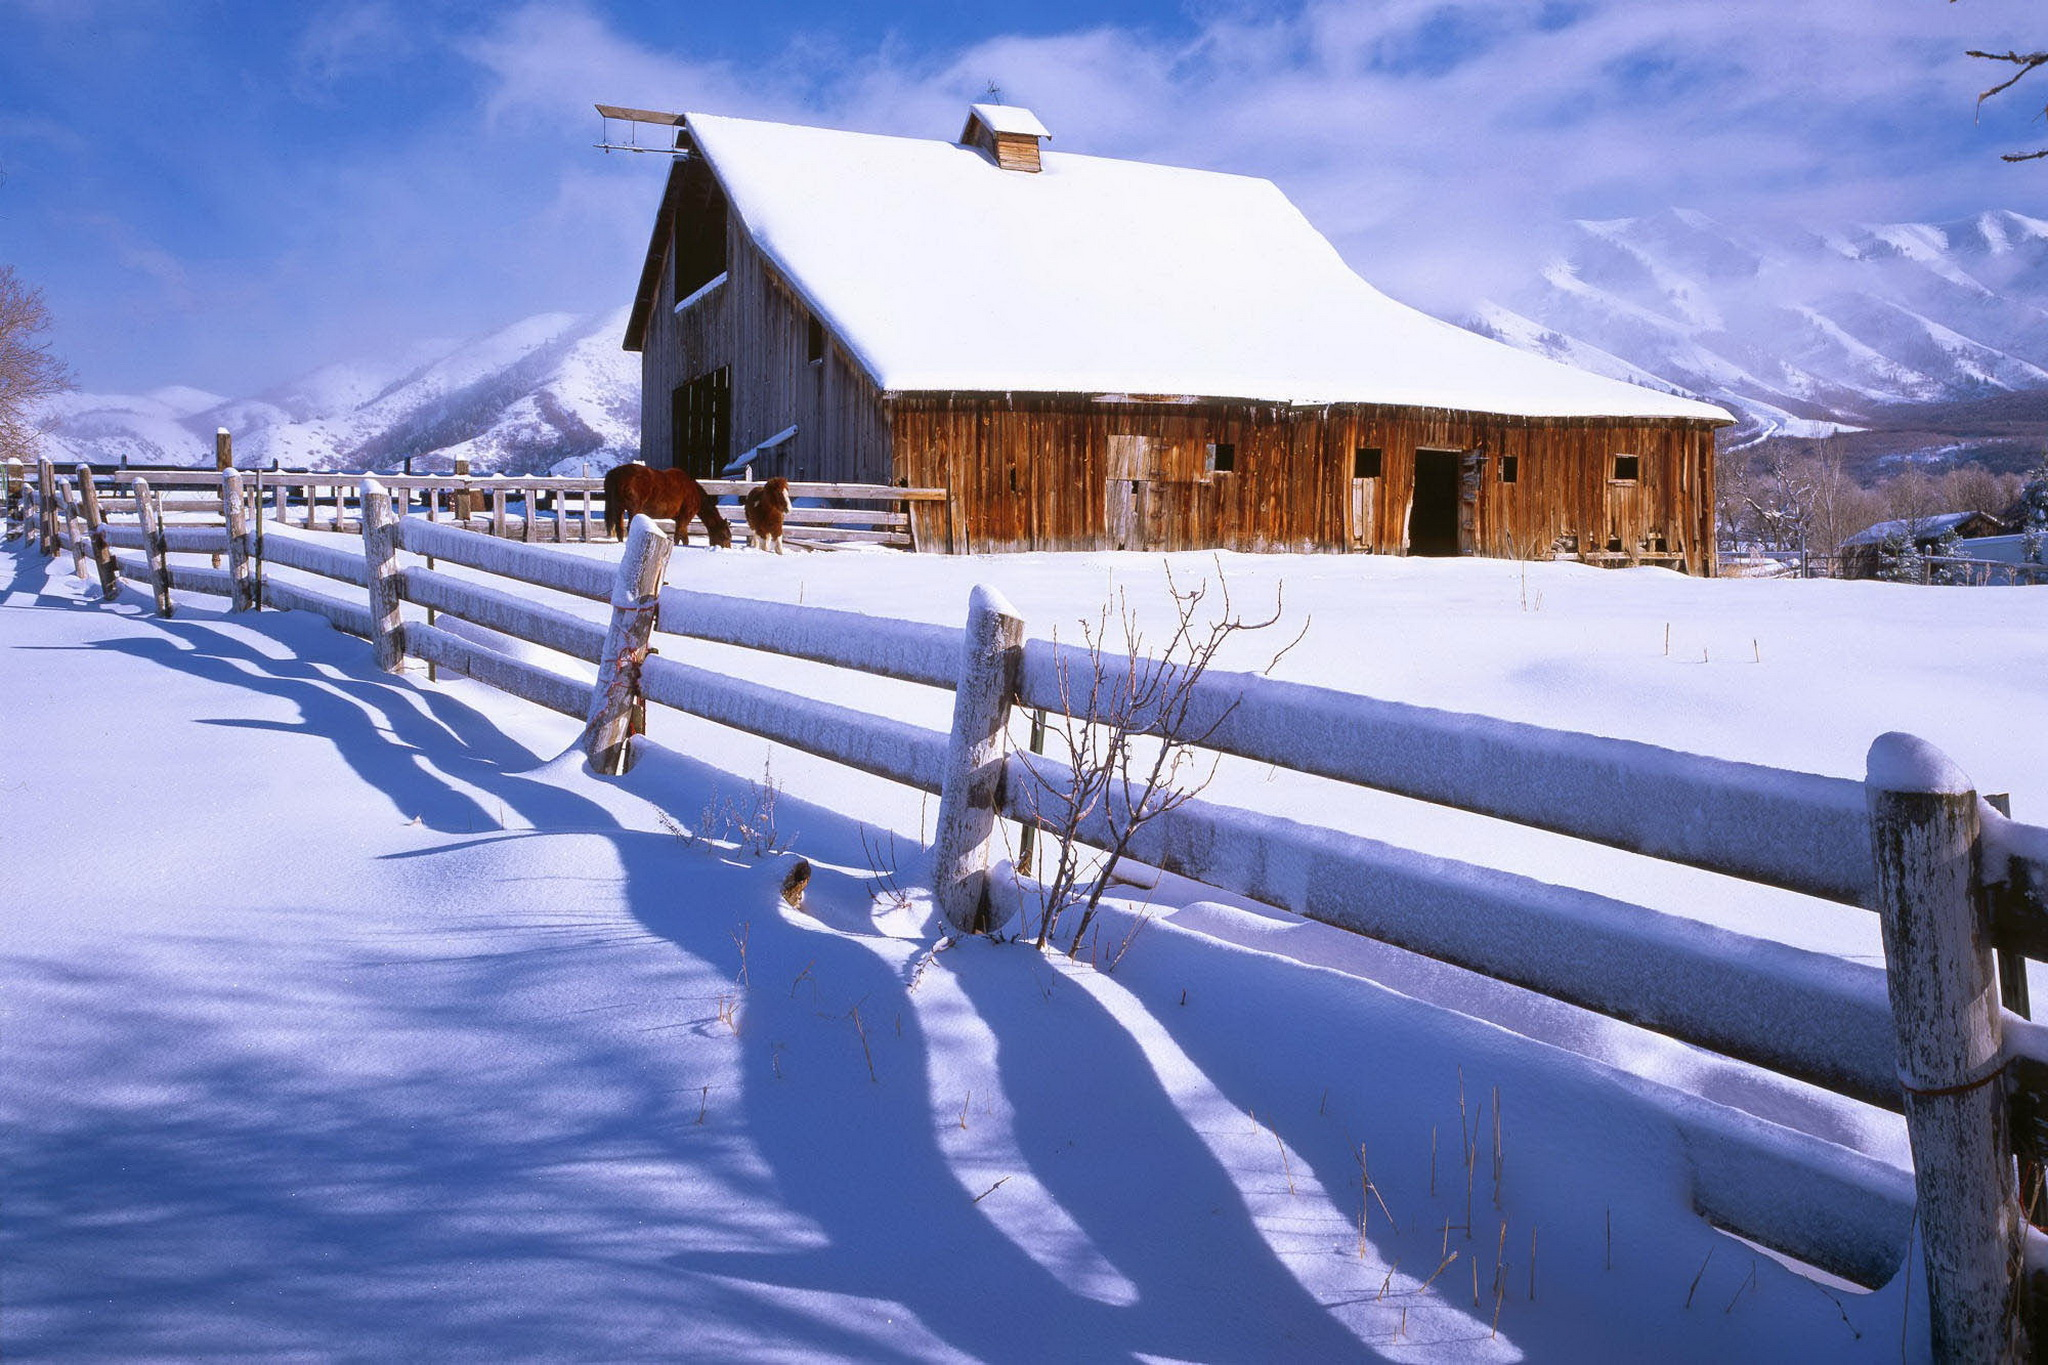 Farm in winter 2048 x 1365 Nature Photography MIRIADNACOM 2048x1365